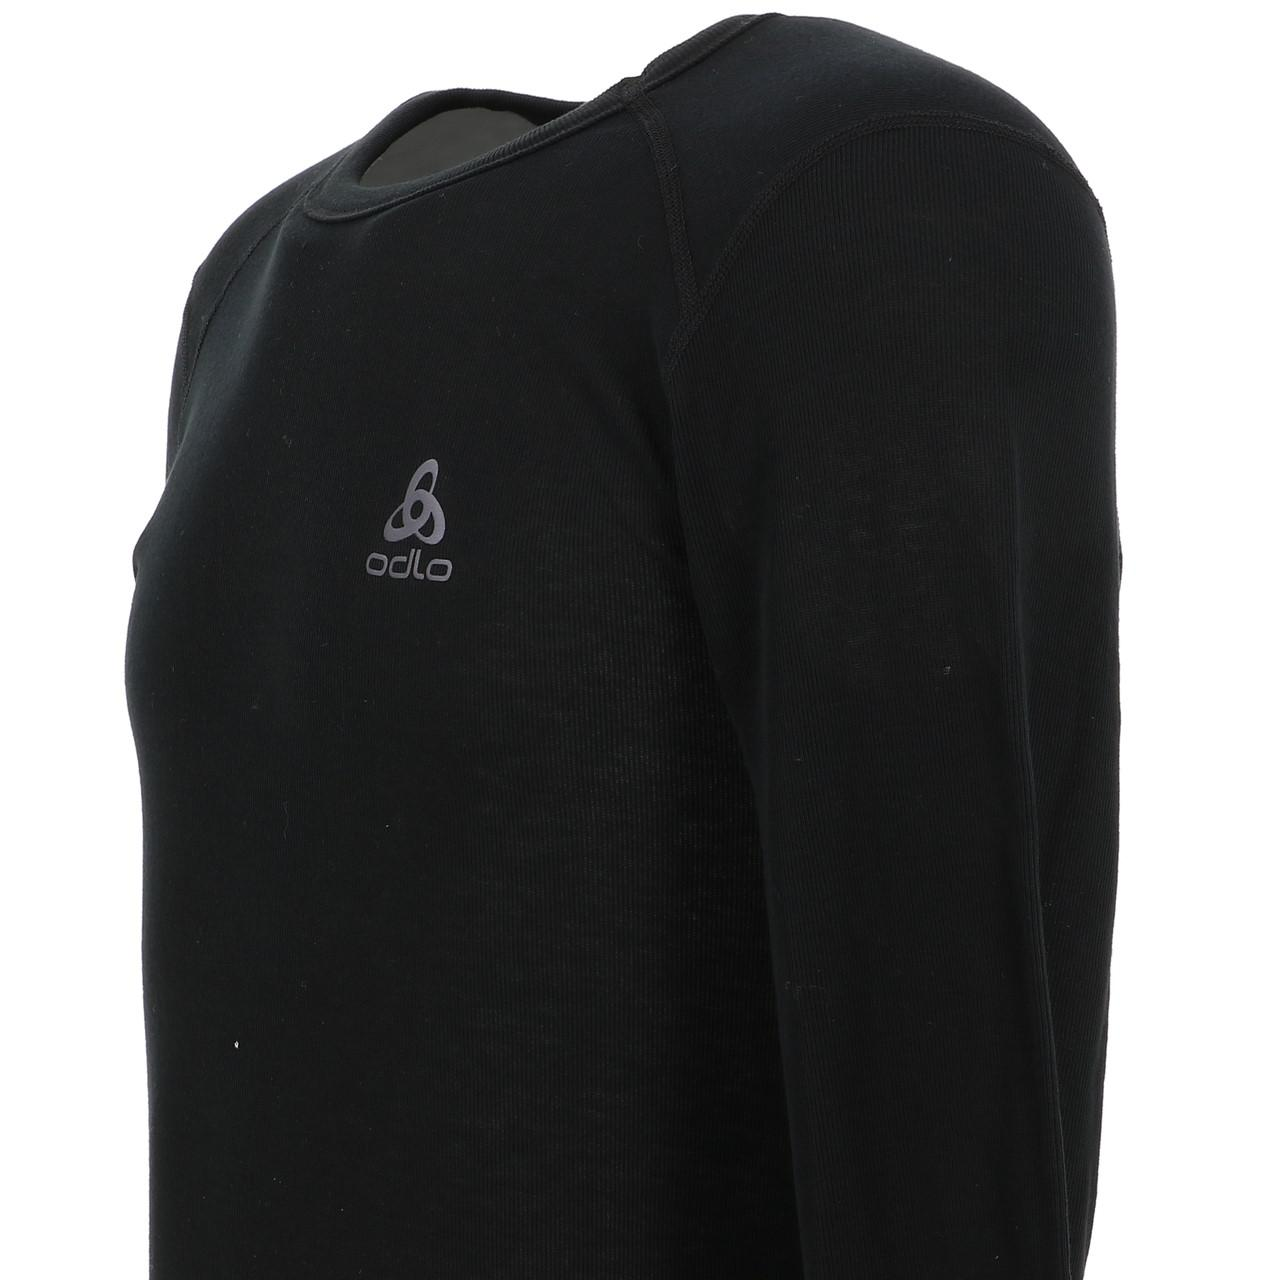 Under-Clothing-Thermal-Hot-Odlo-Warm-Black-DRC-ML-Tee-Black-85353-New thumbnail 3